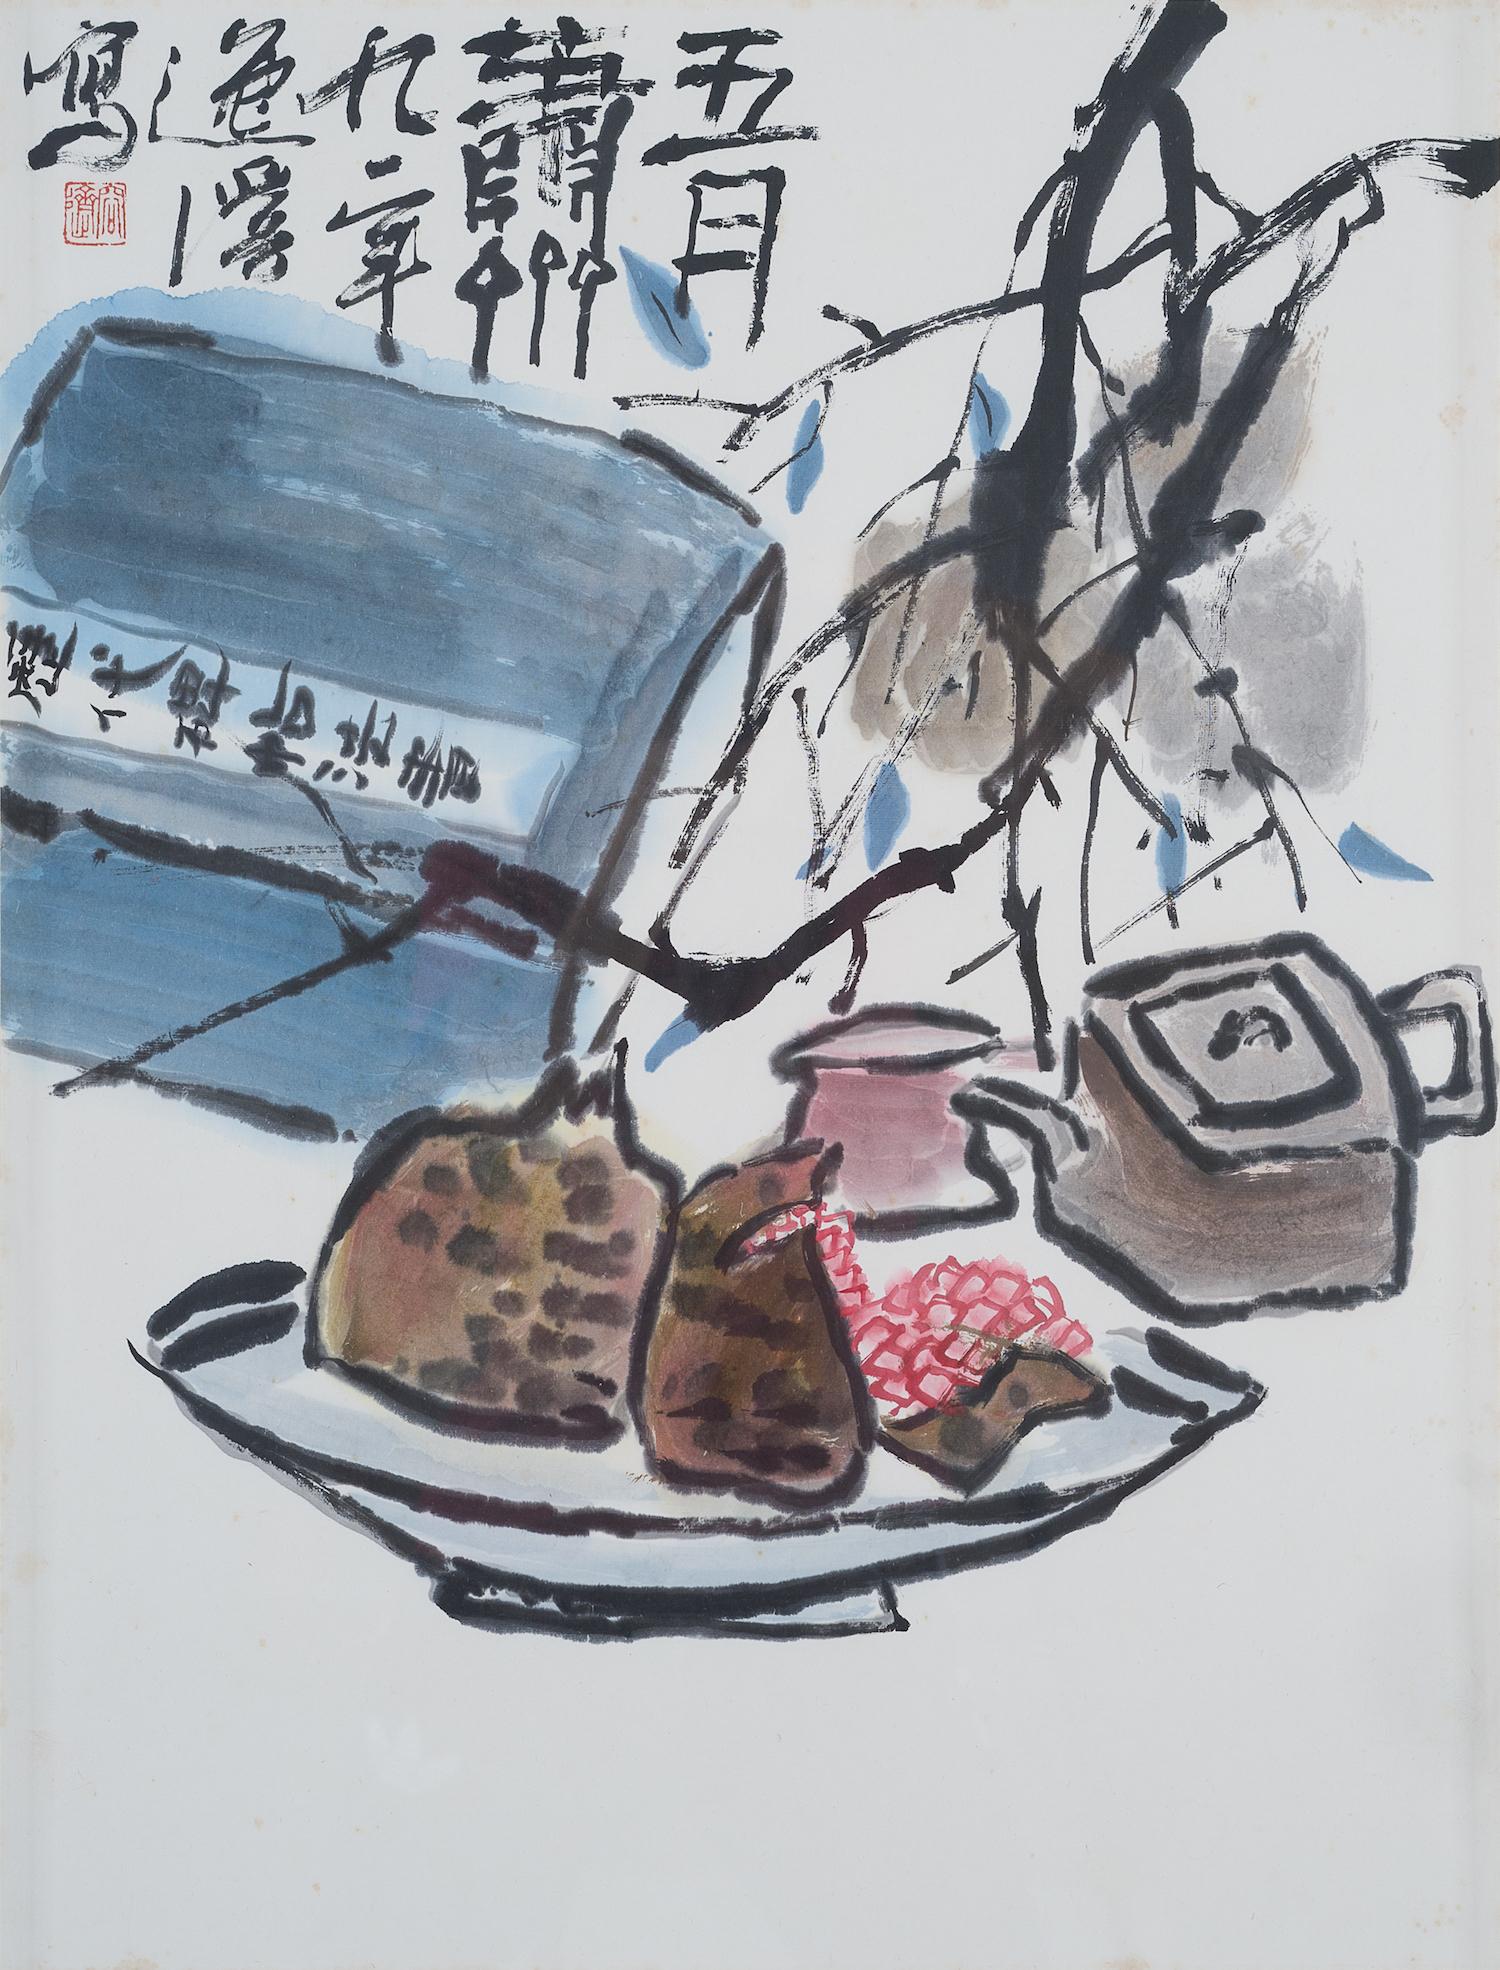 Chua Ek Kay, 'A Repast', 1992, ink on rice paper, 67.5 x 51cm. Image courtesy of Art Agenda, S.E.A..